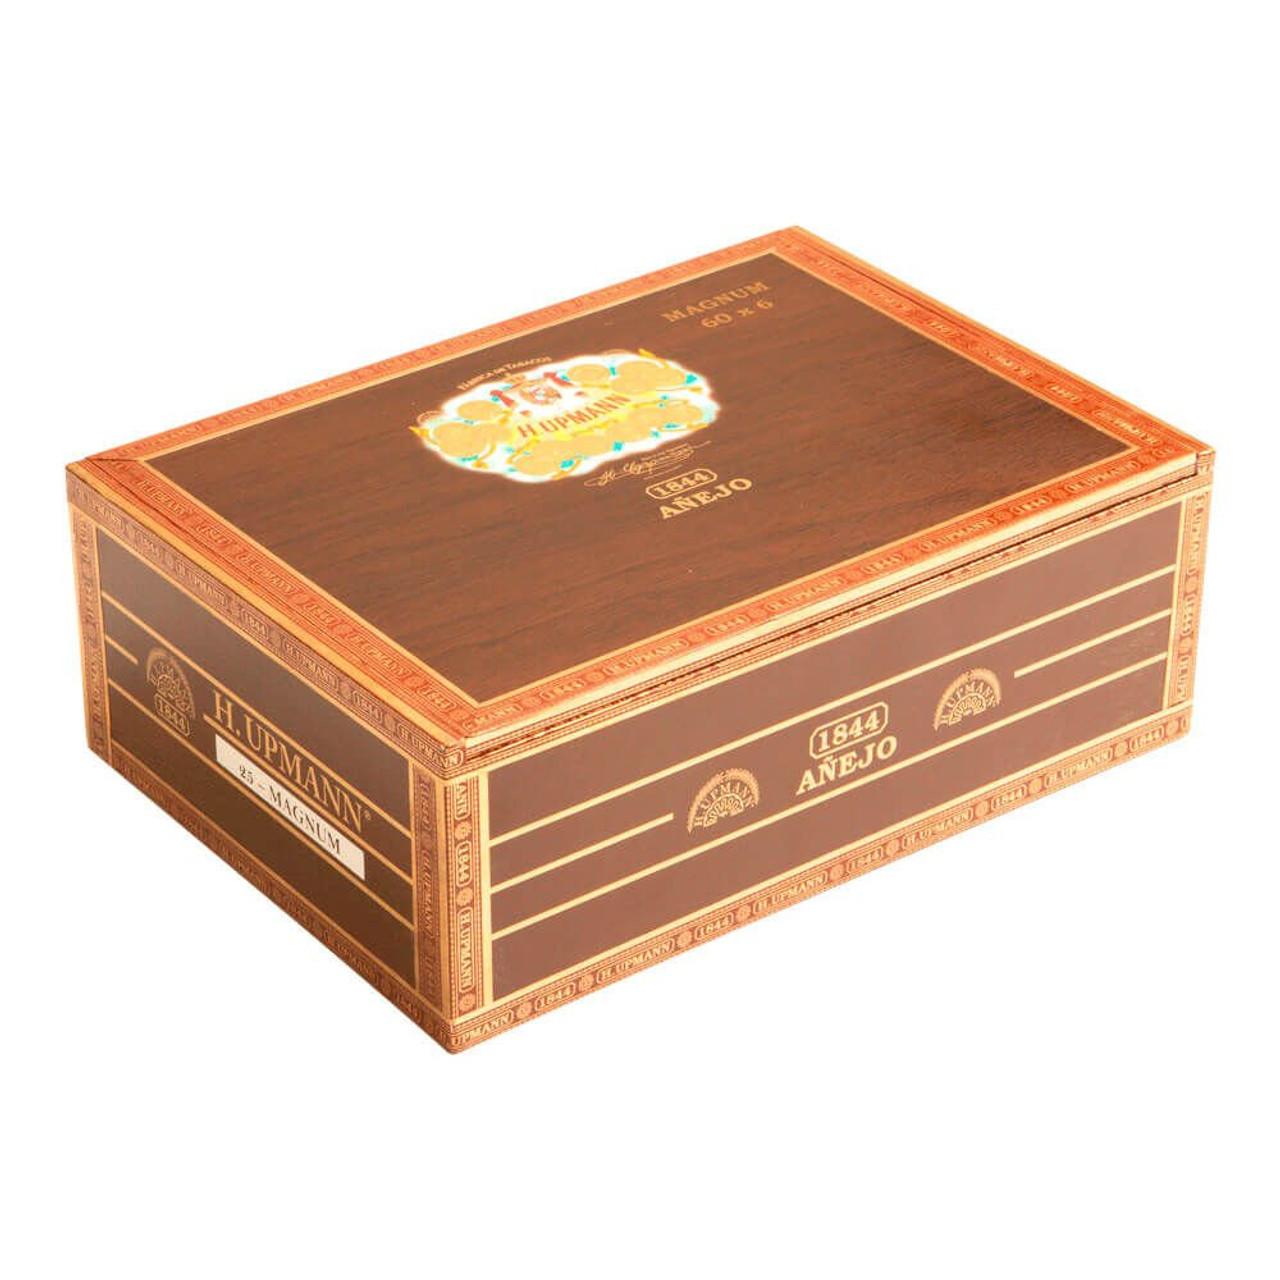 H. Upmann 1844 Anejo Toro Cigars - 6 x 54 (Box of 25)